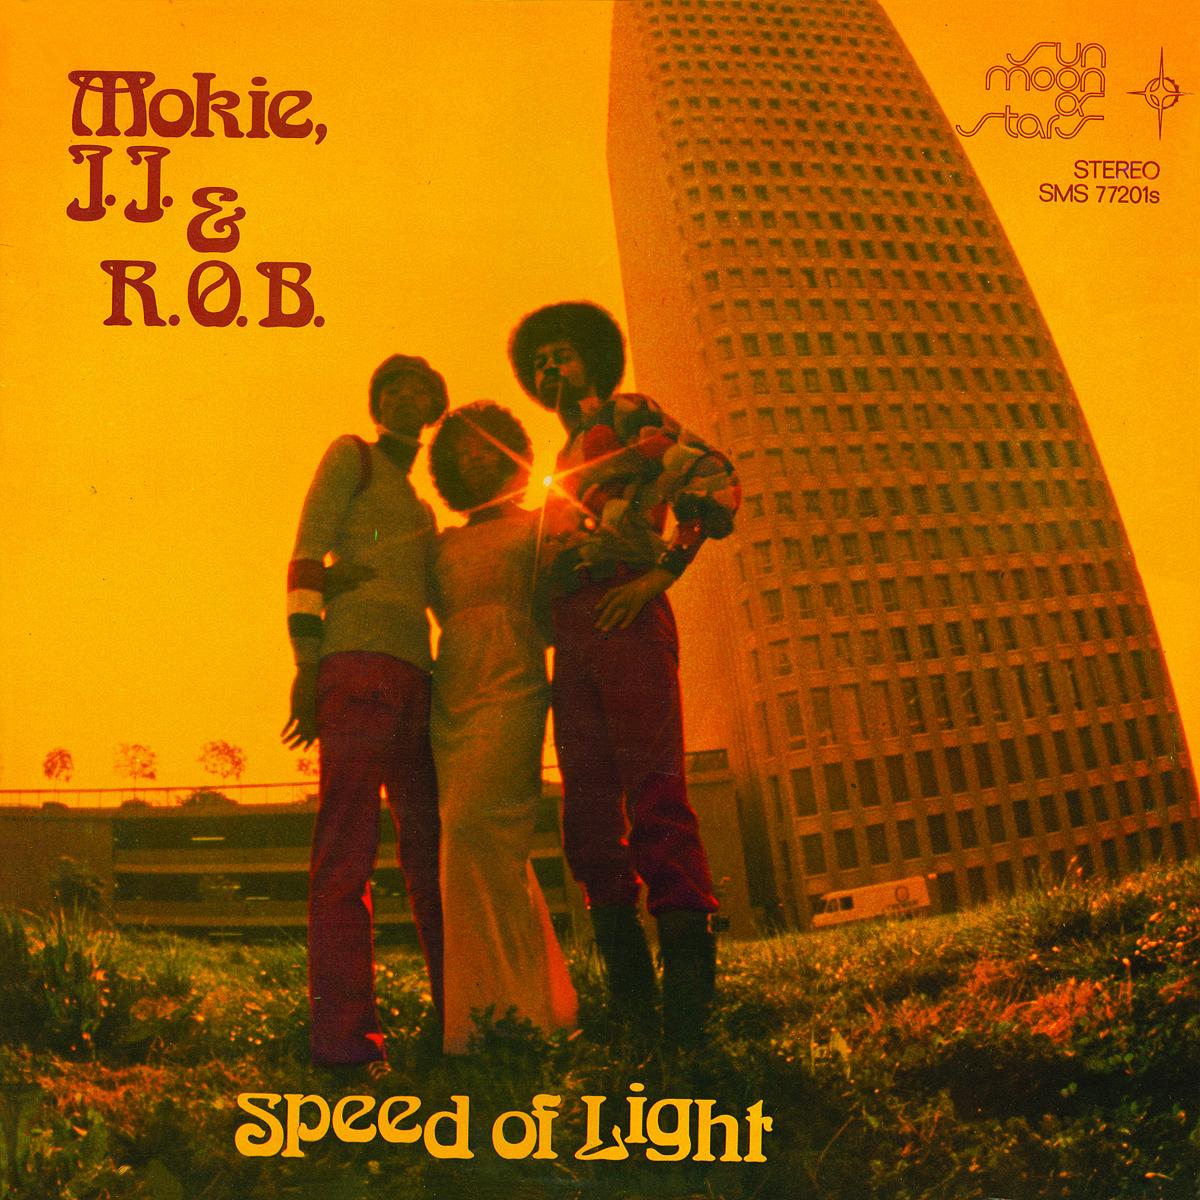 Sun, Moon & Stars Records (SMS 7201s)